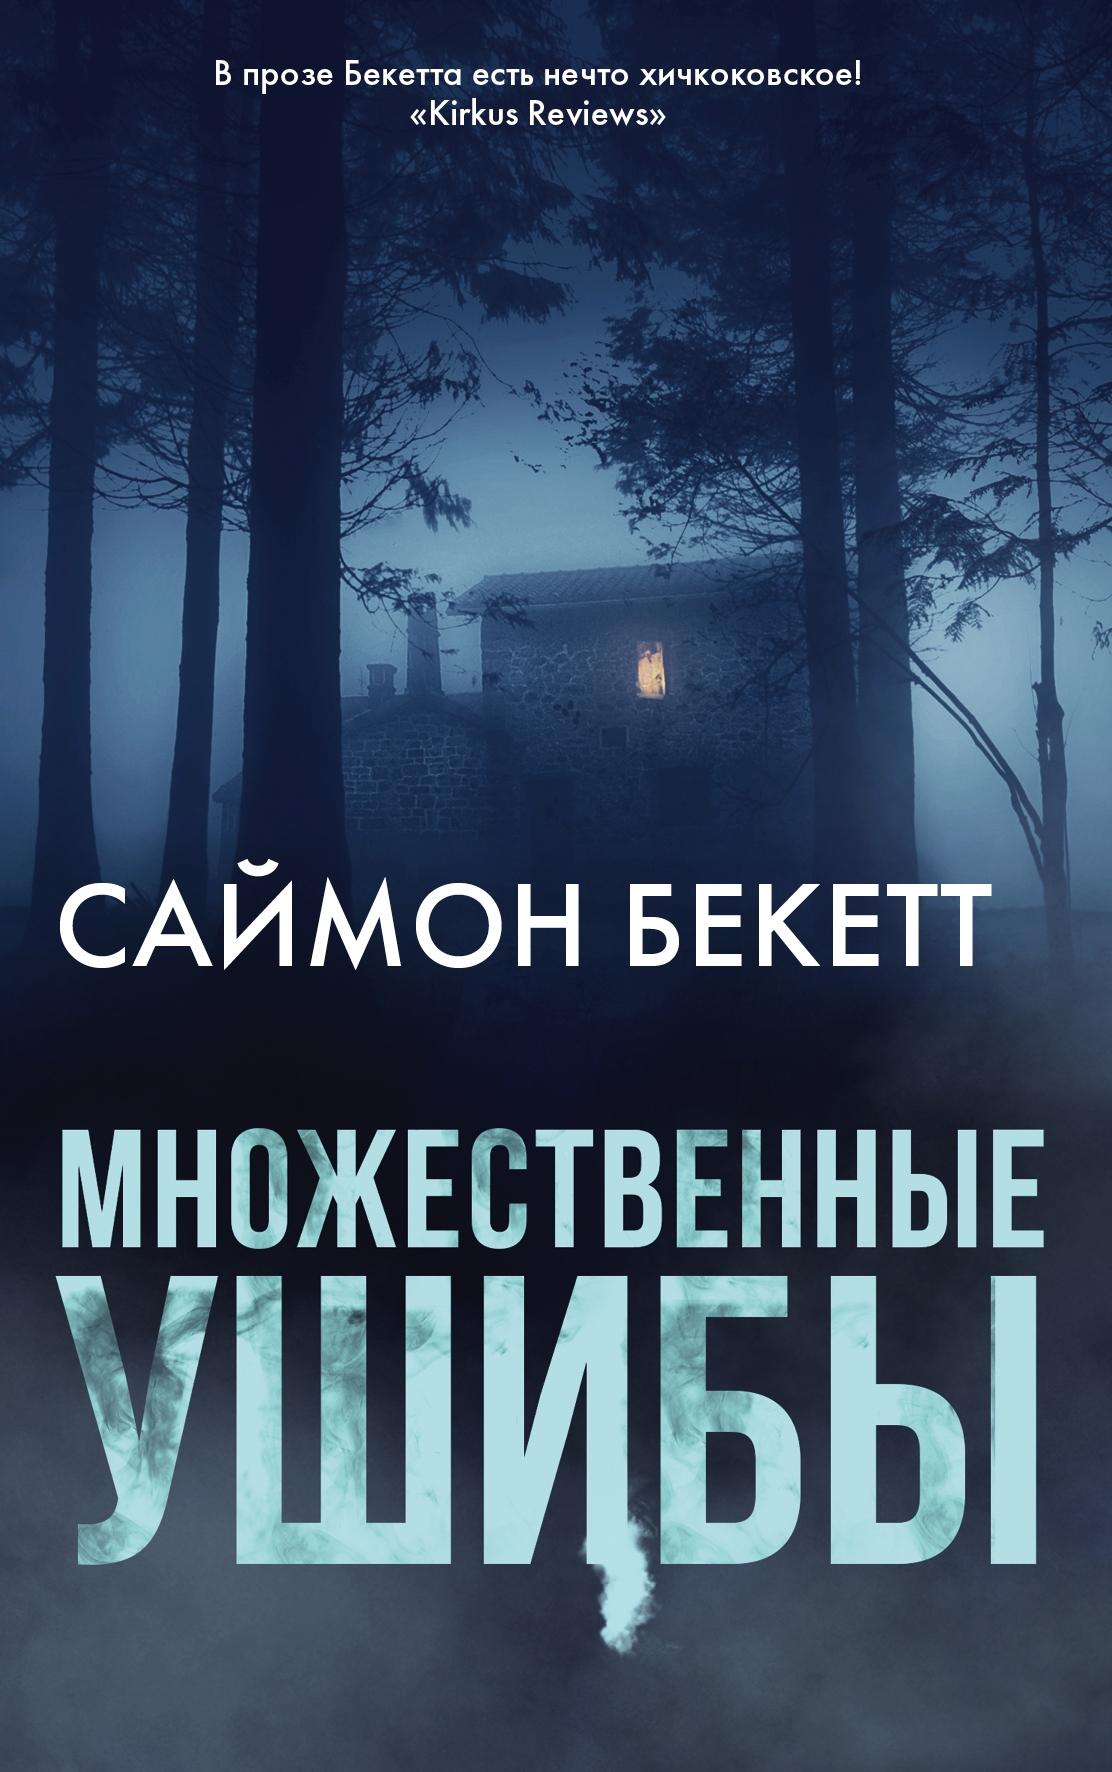 Множественные ушибы - Саймон Бекетт